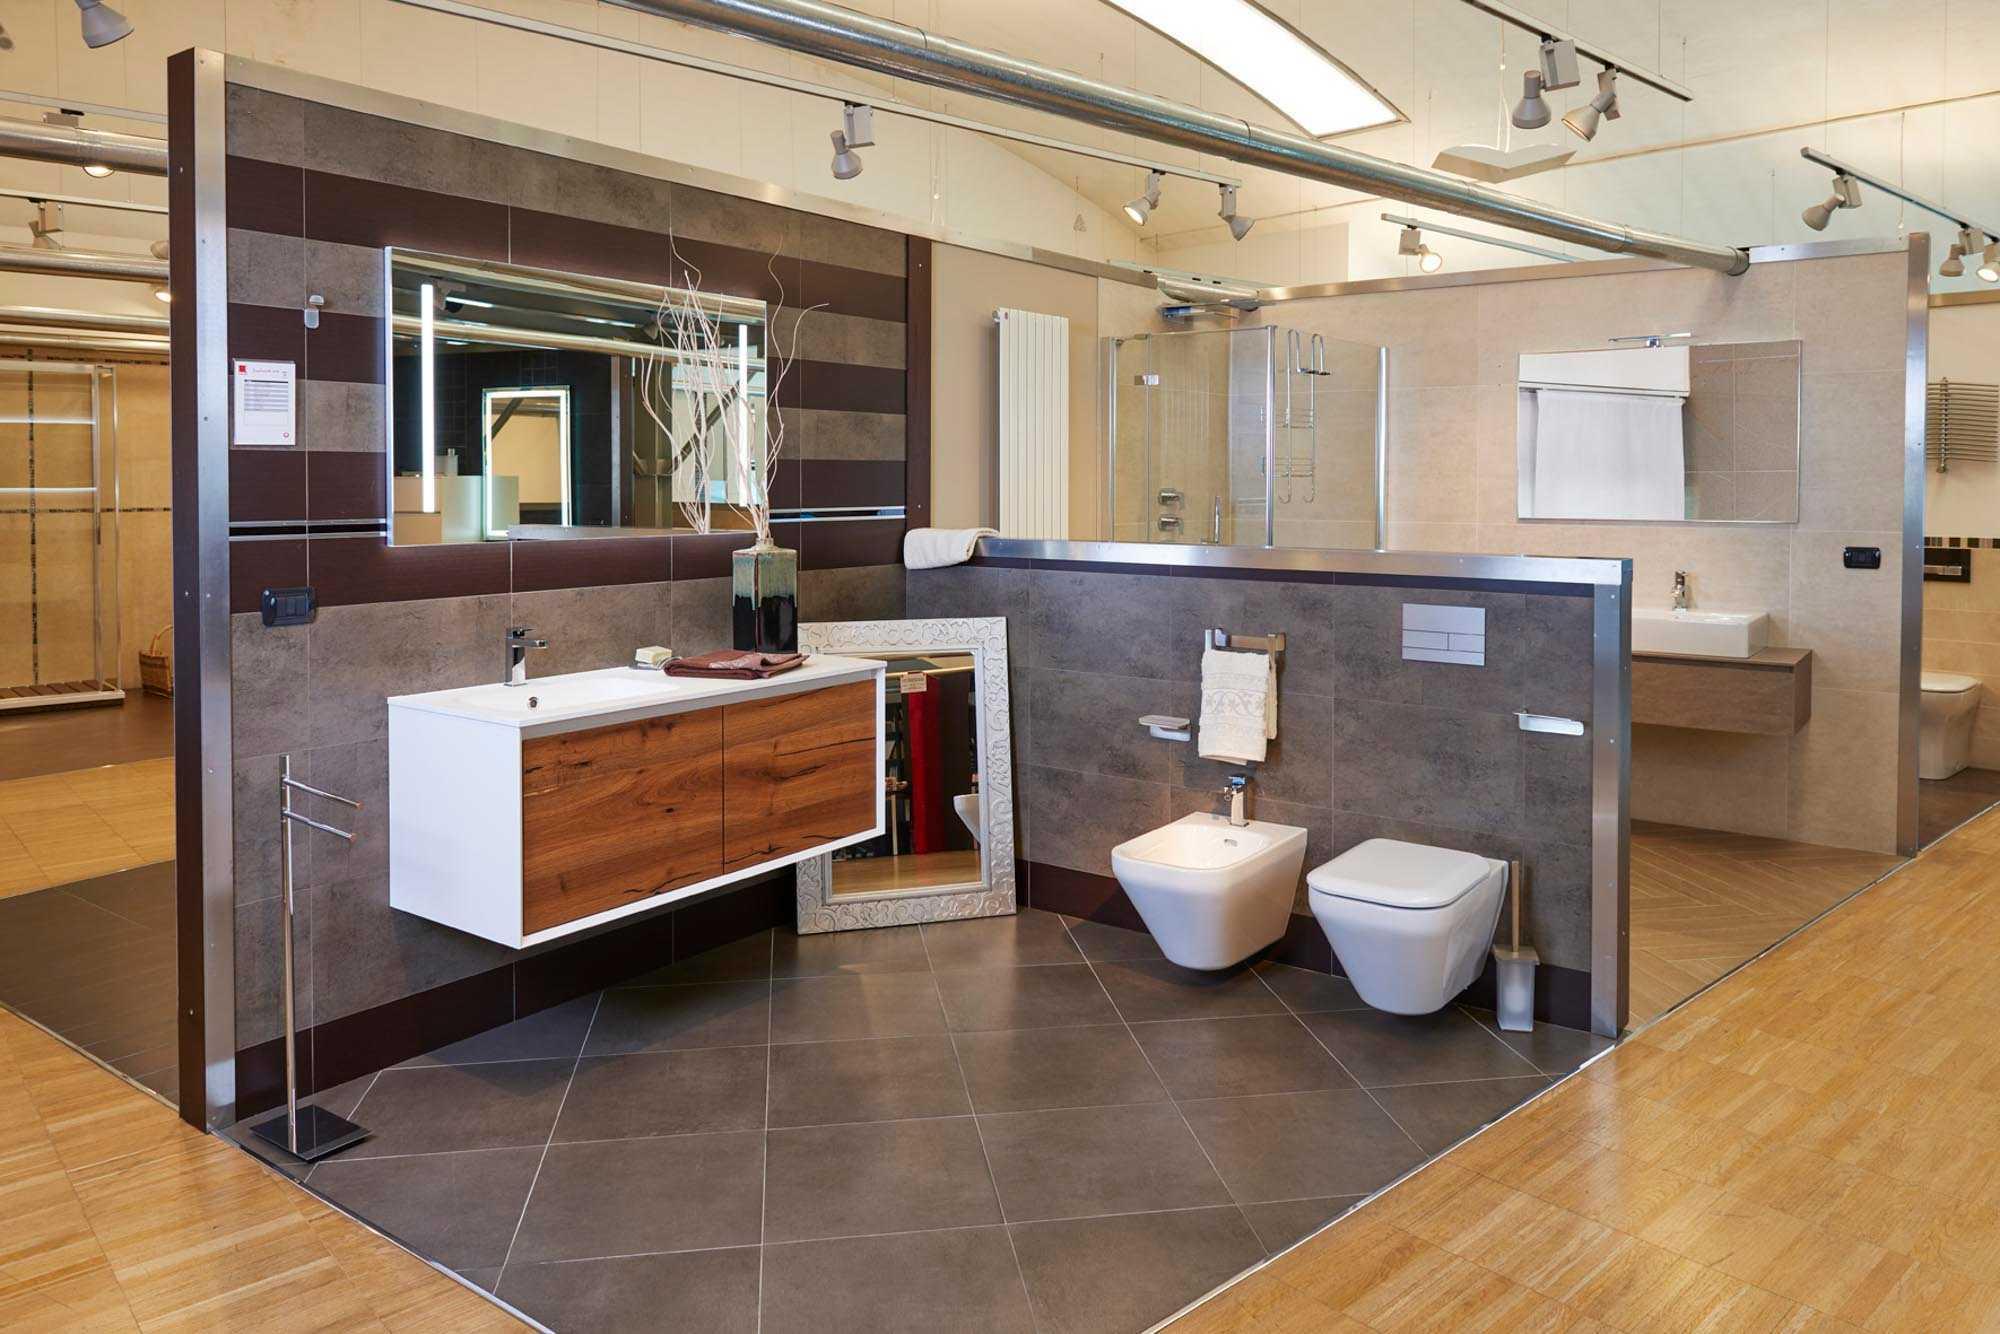 Showroom SVAI_Colognola_arredobagno moderno